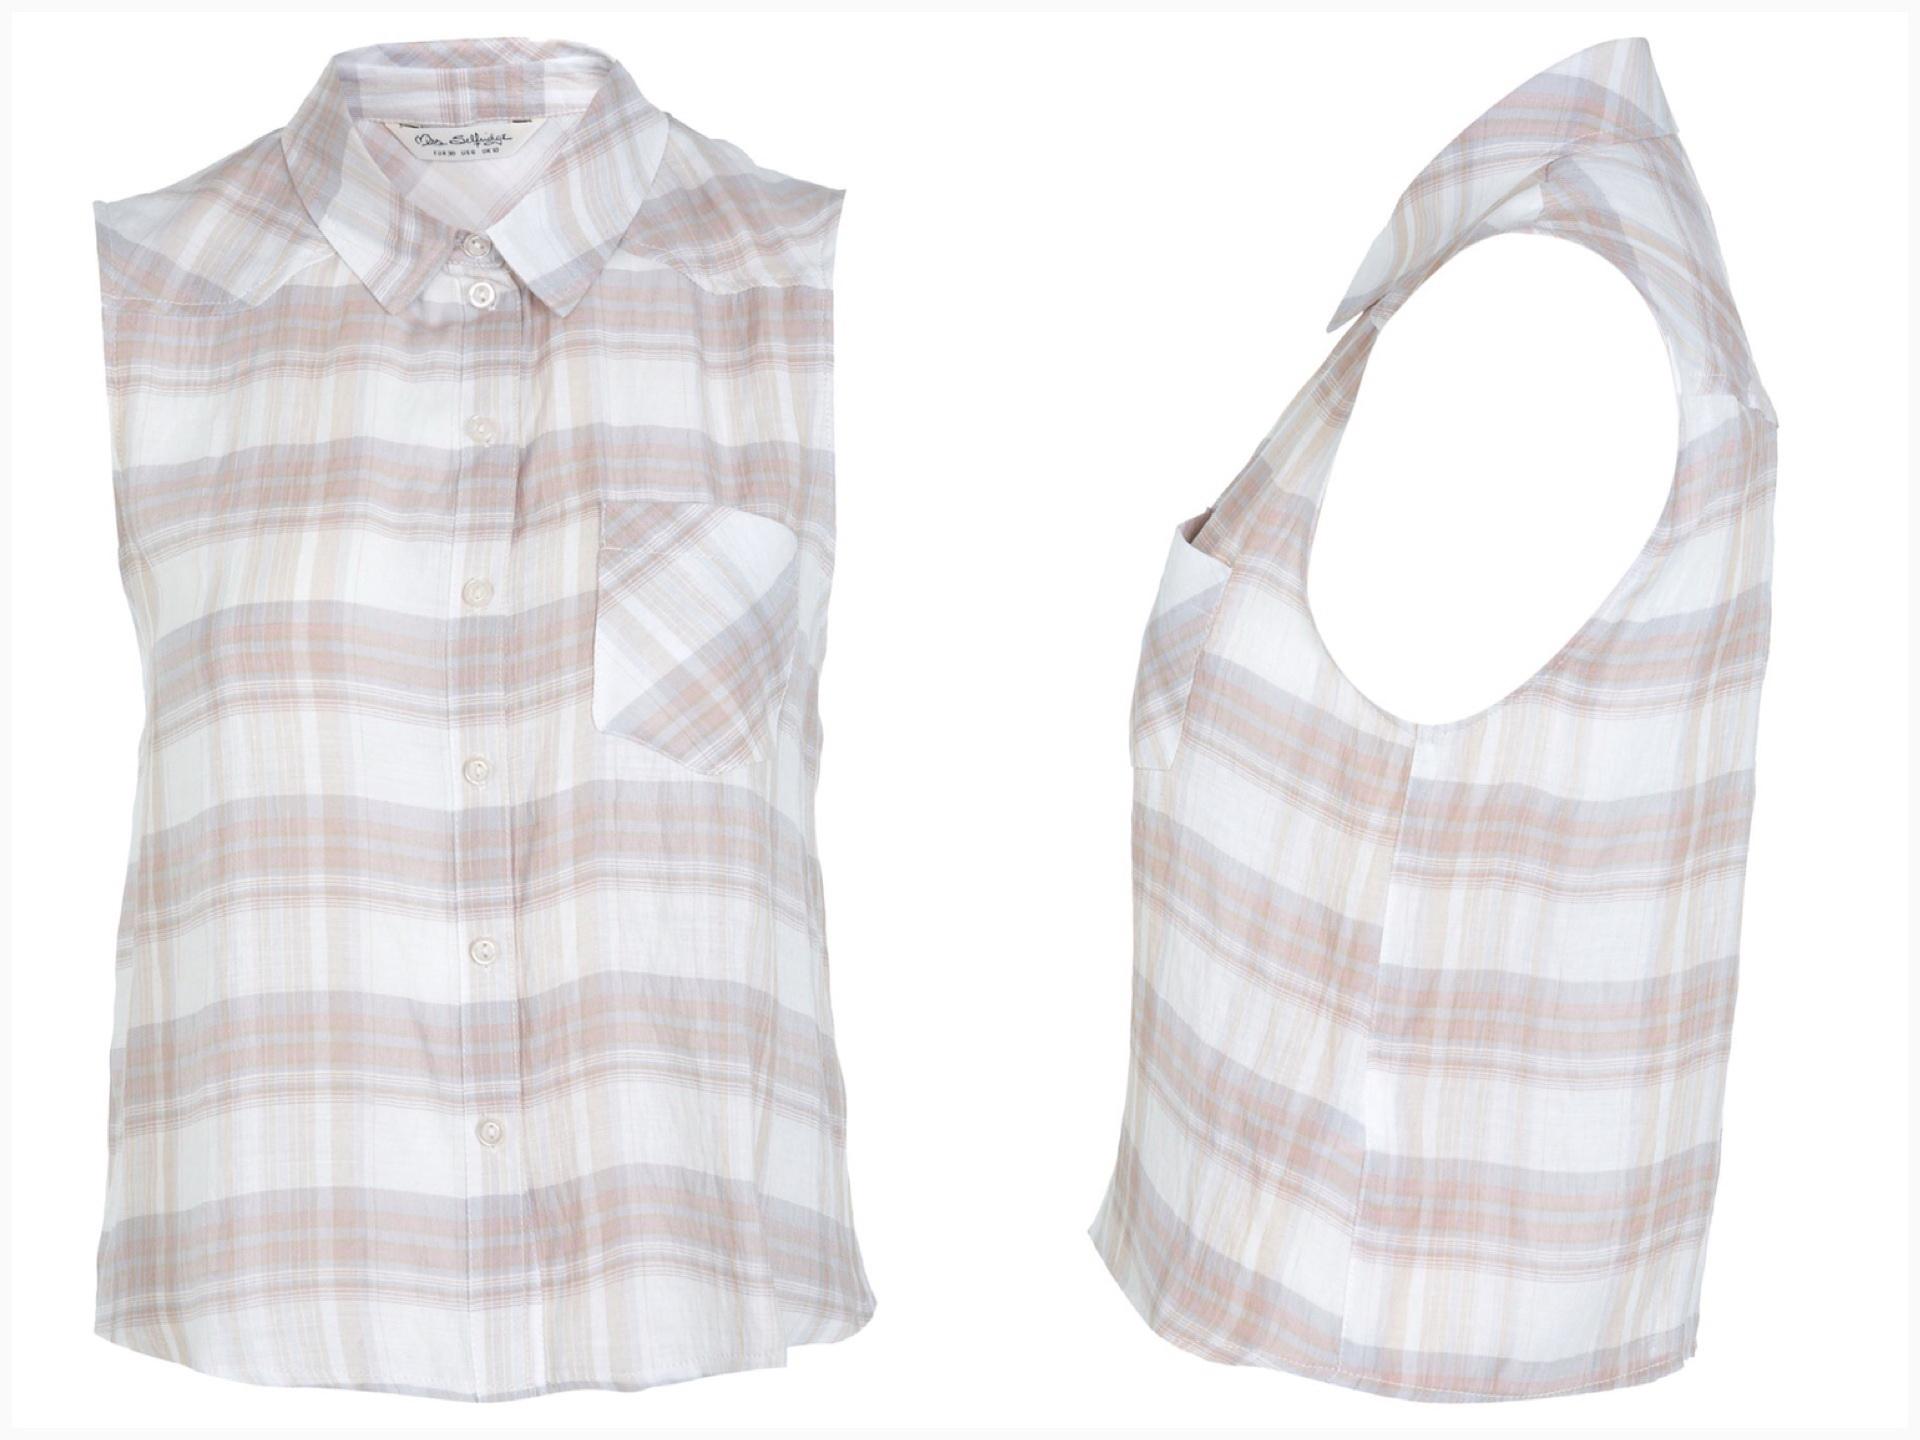 Miss selffirdge shirt Top Size Uk8=1 UK10=1